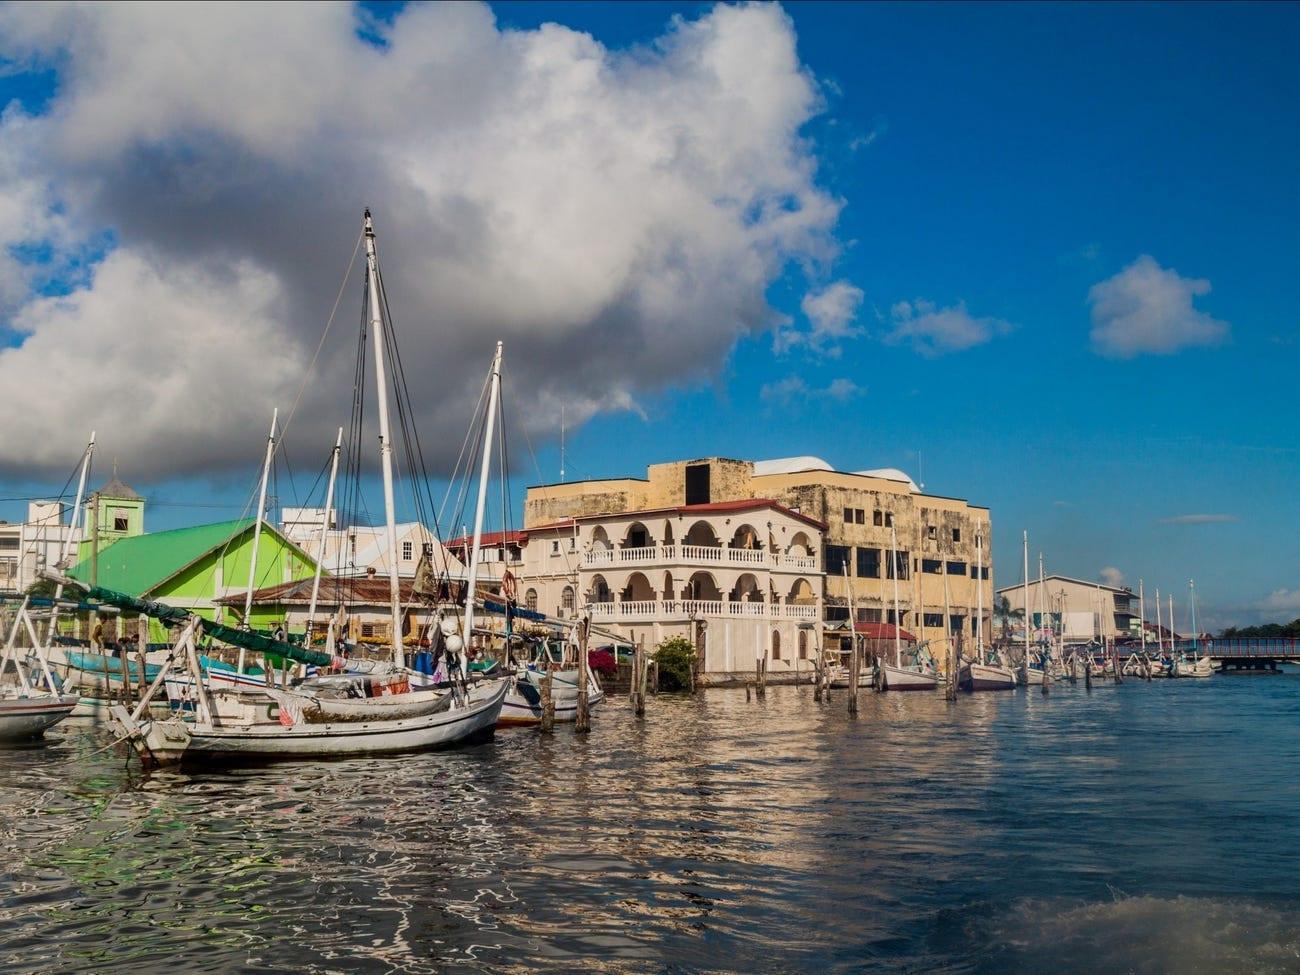 Belize City waterfront sailboats